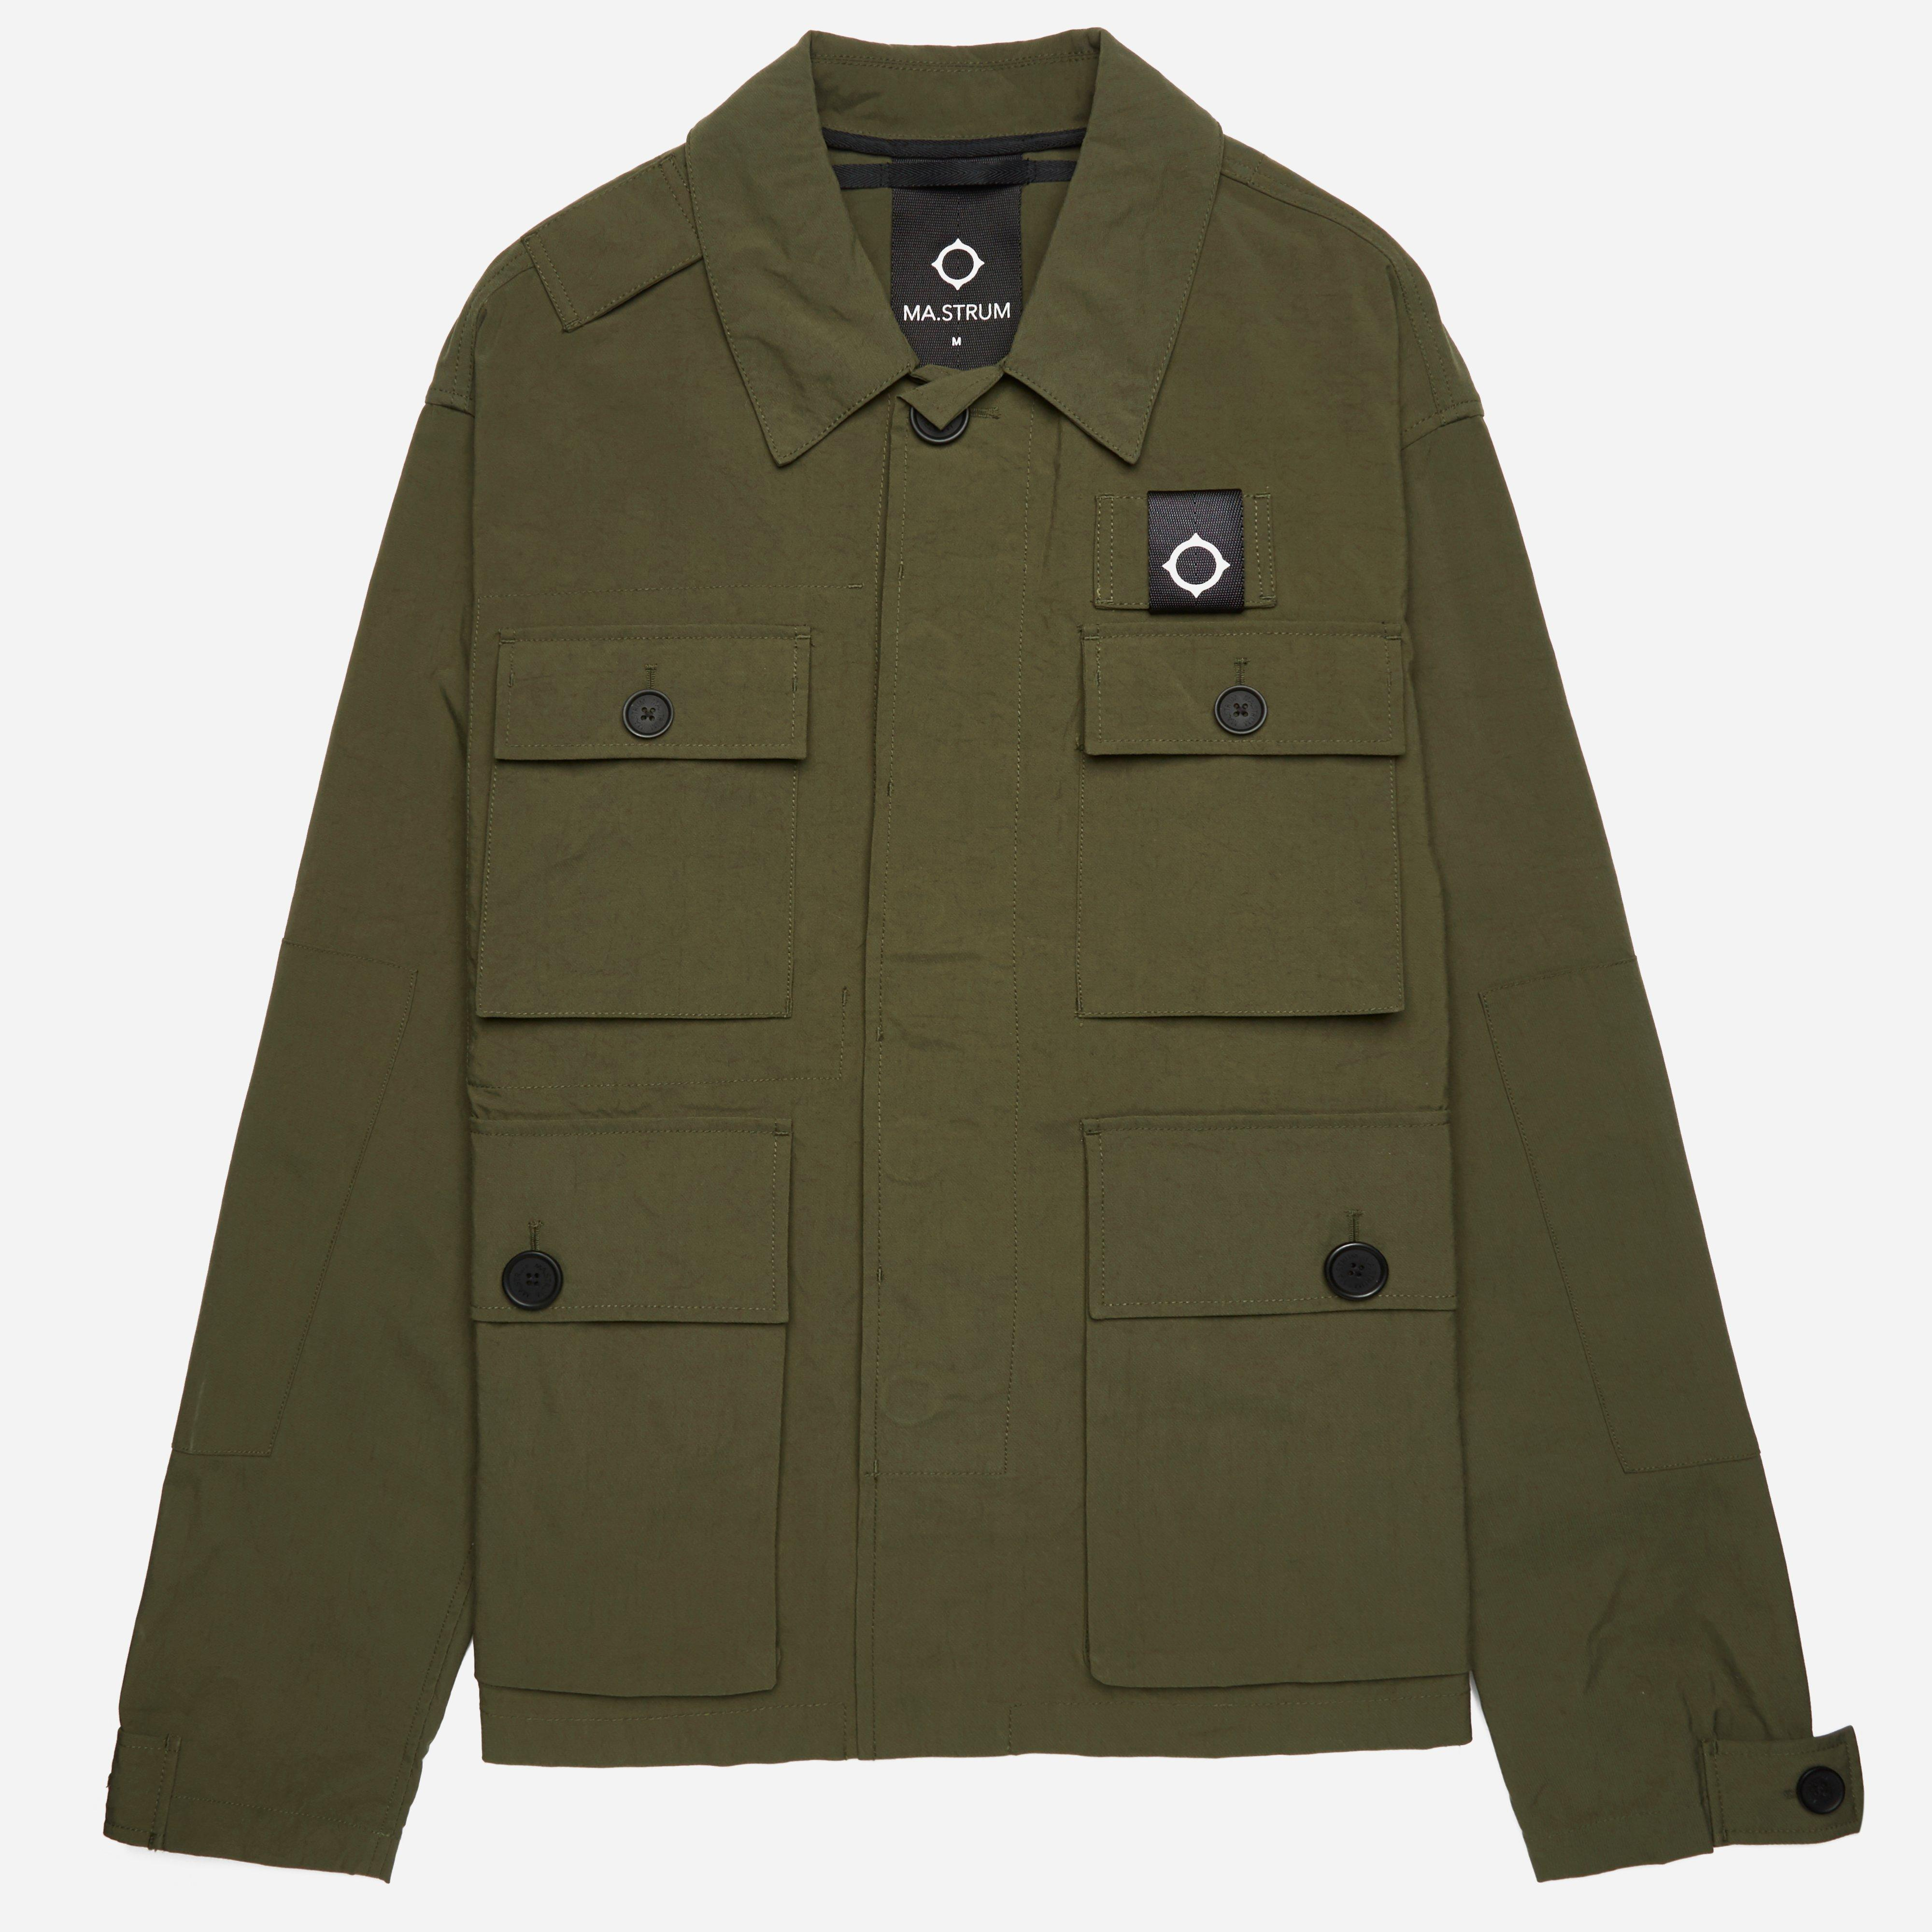 MA.STRUM Charioteen Bomber Jacket